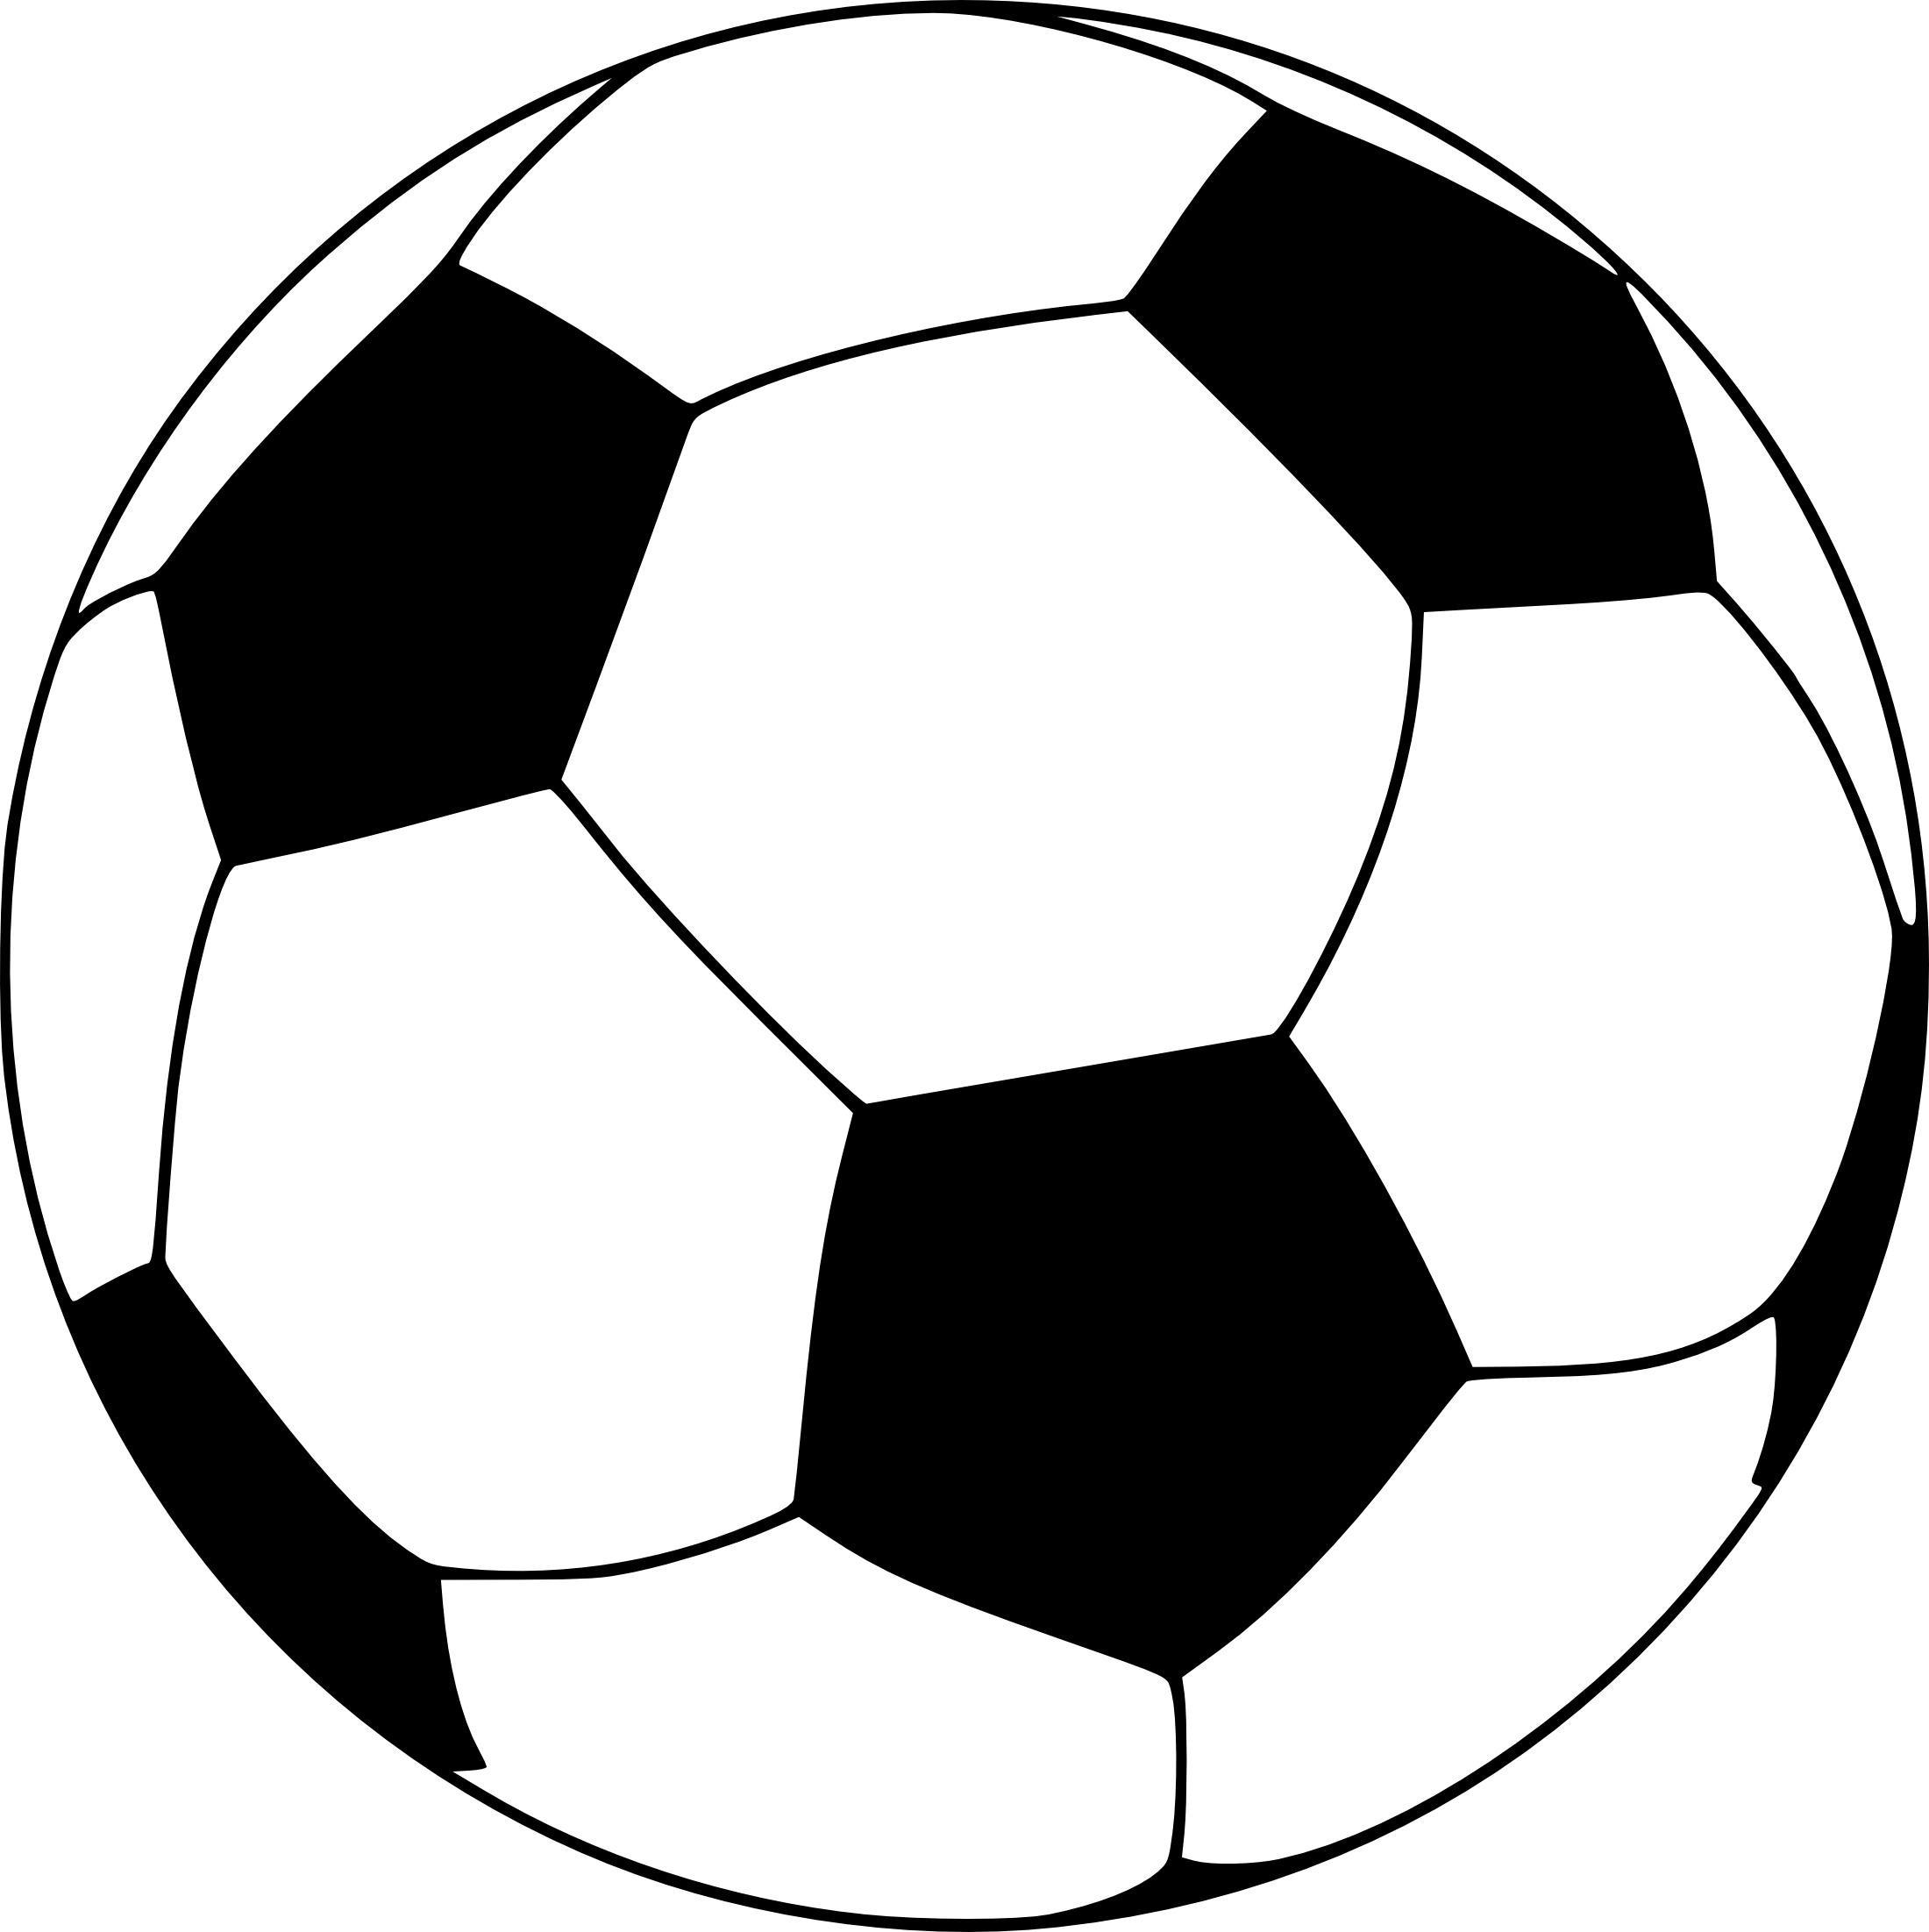 Coloriage Ballon De Foot A Imprimer - Jobstips pour Dessin De Foot A Imprimer